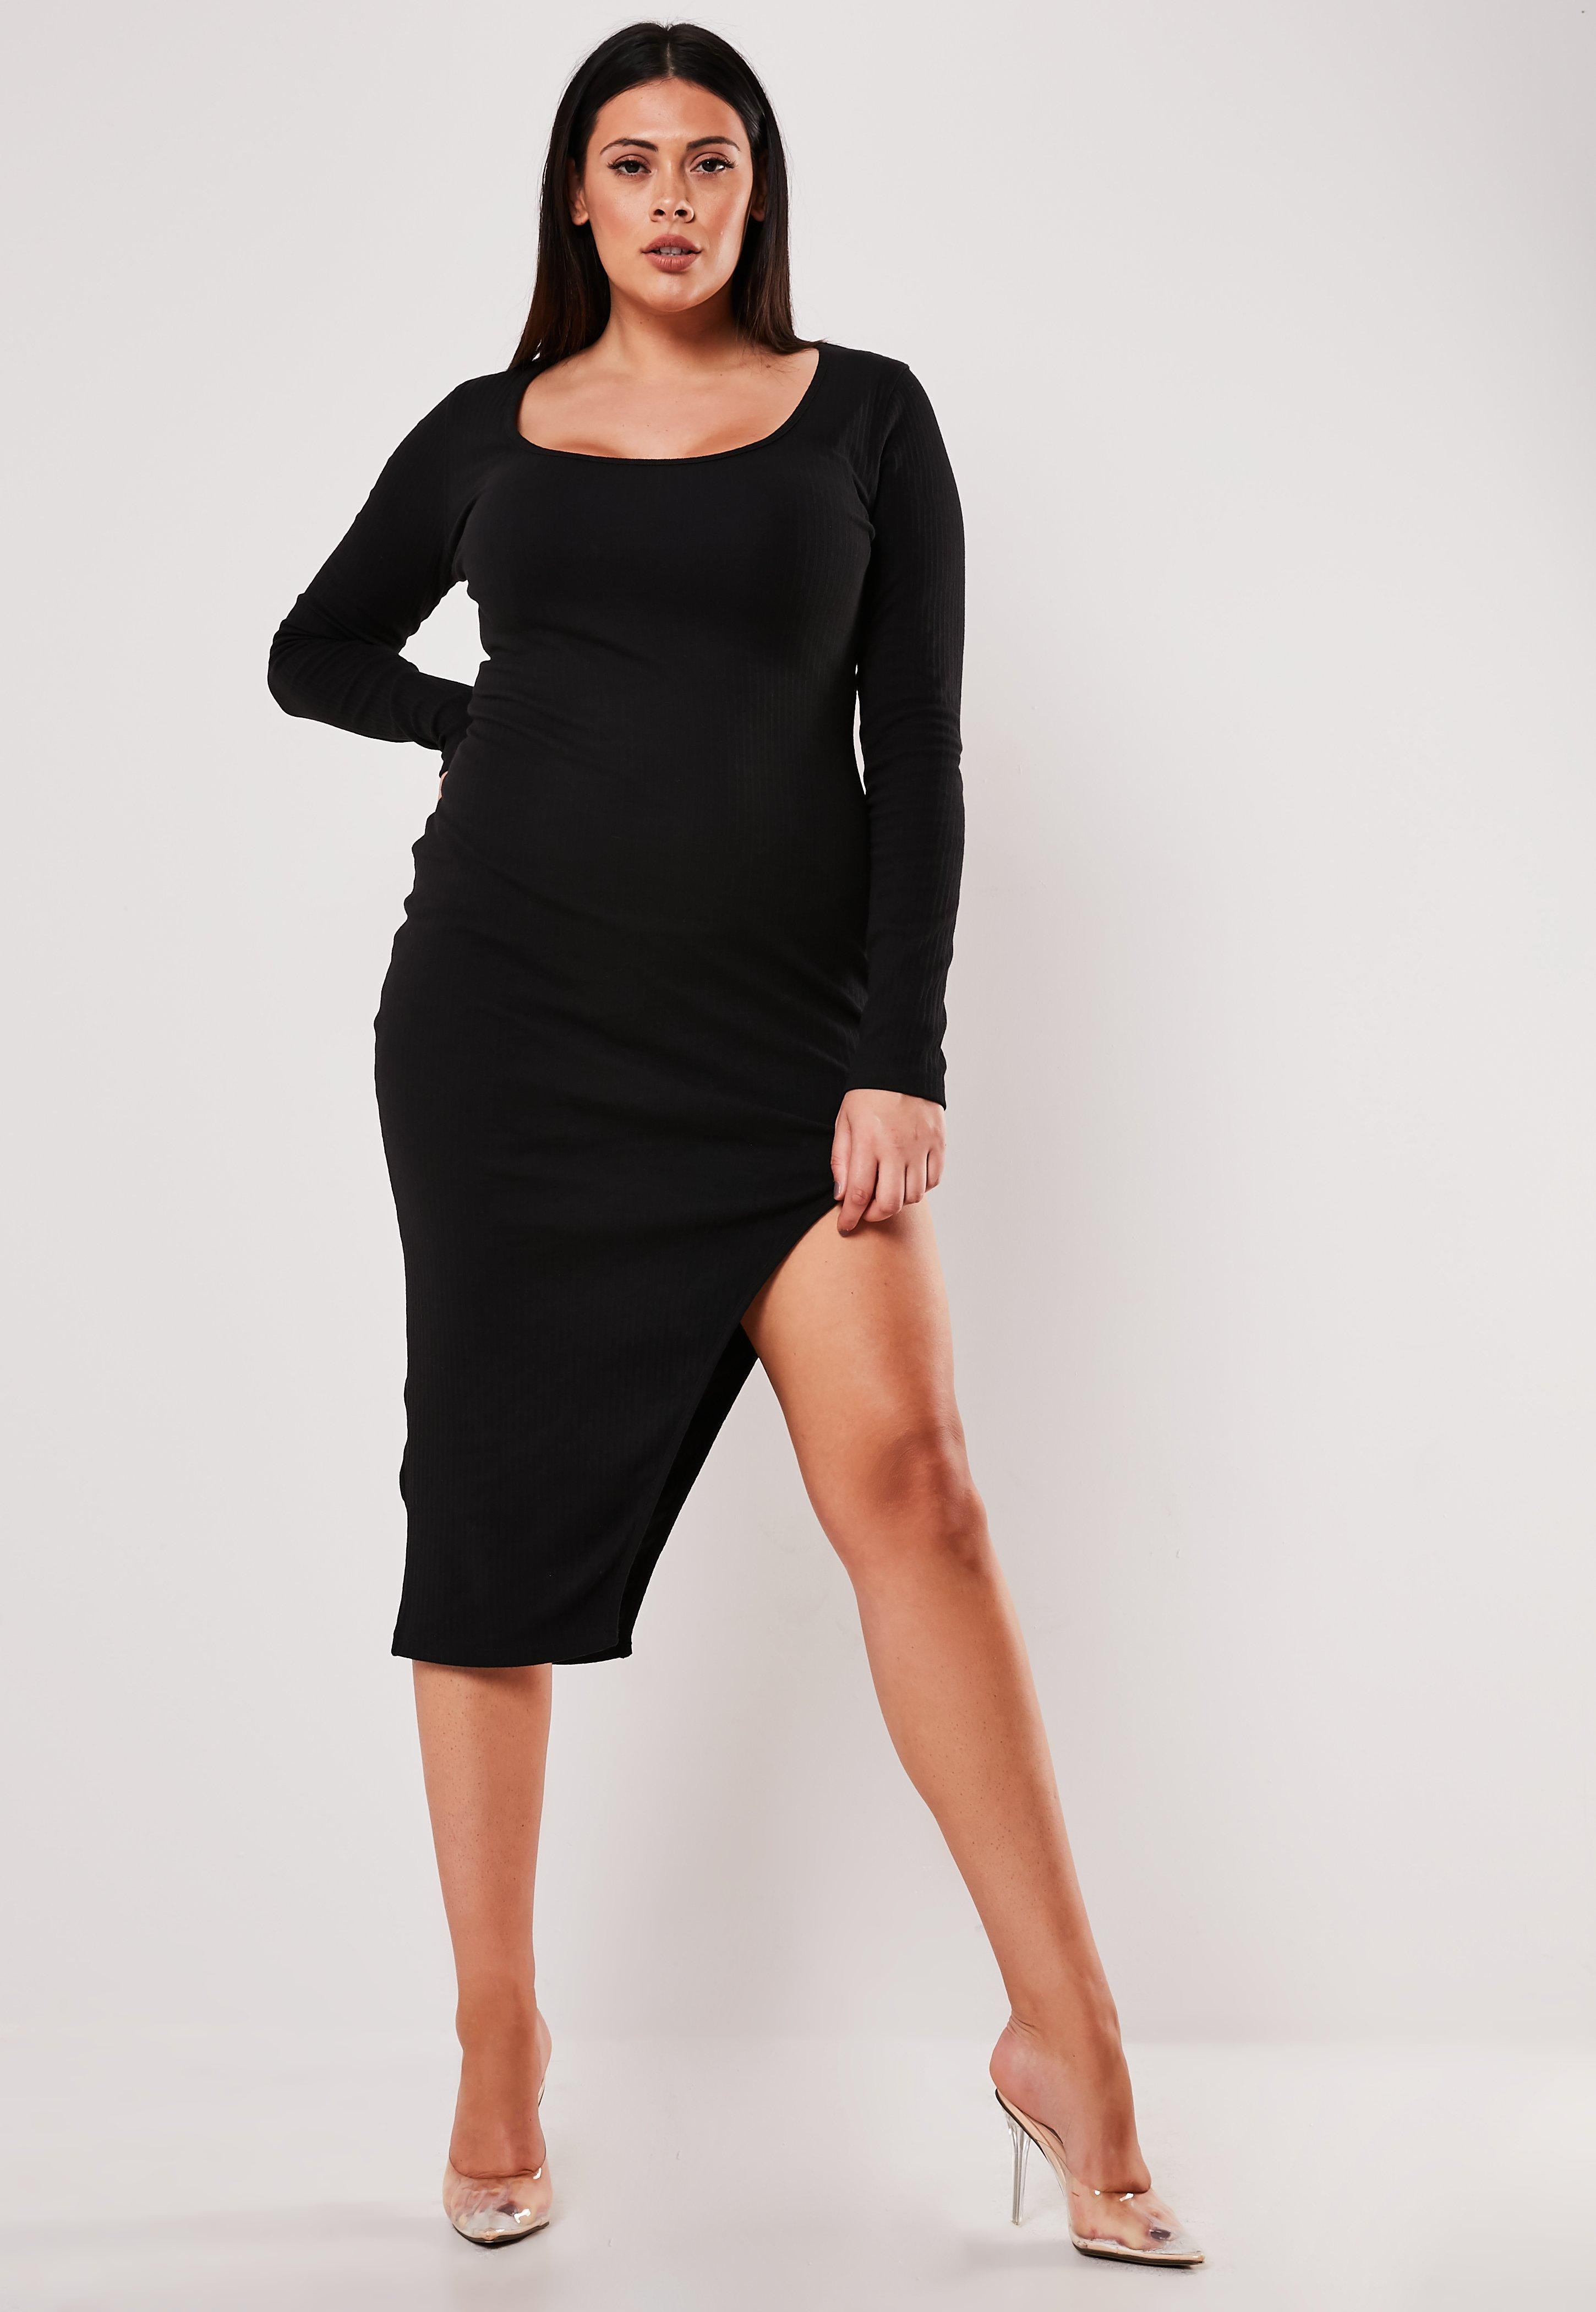 bc3eea0ba0 Figurbetonte Kleider online shoppen - Missguided DE